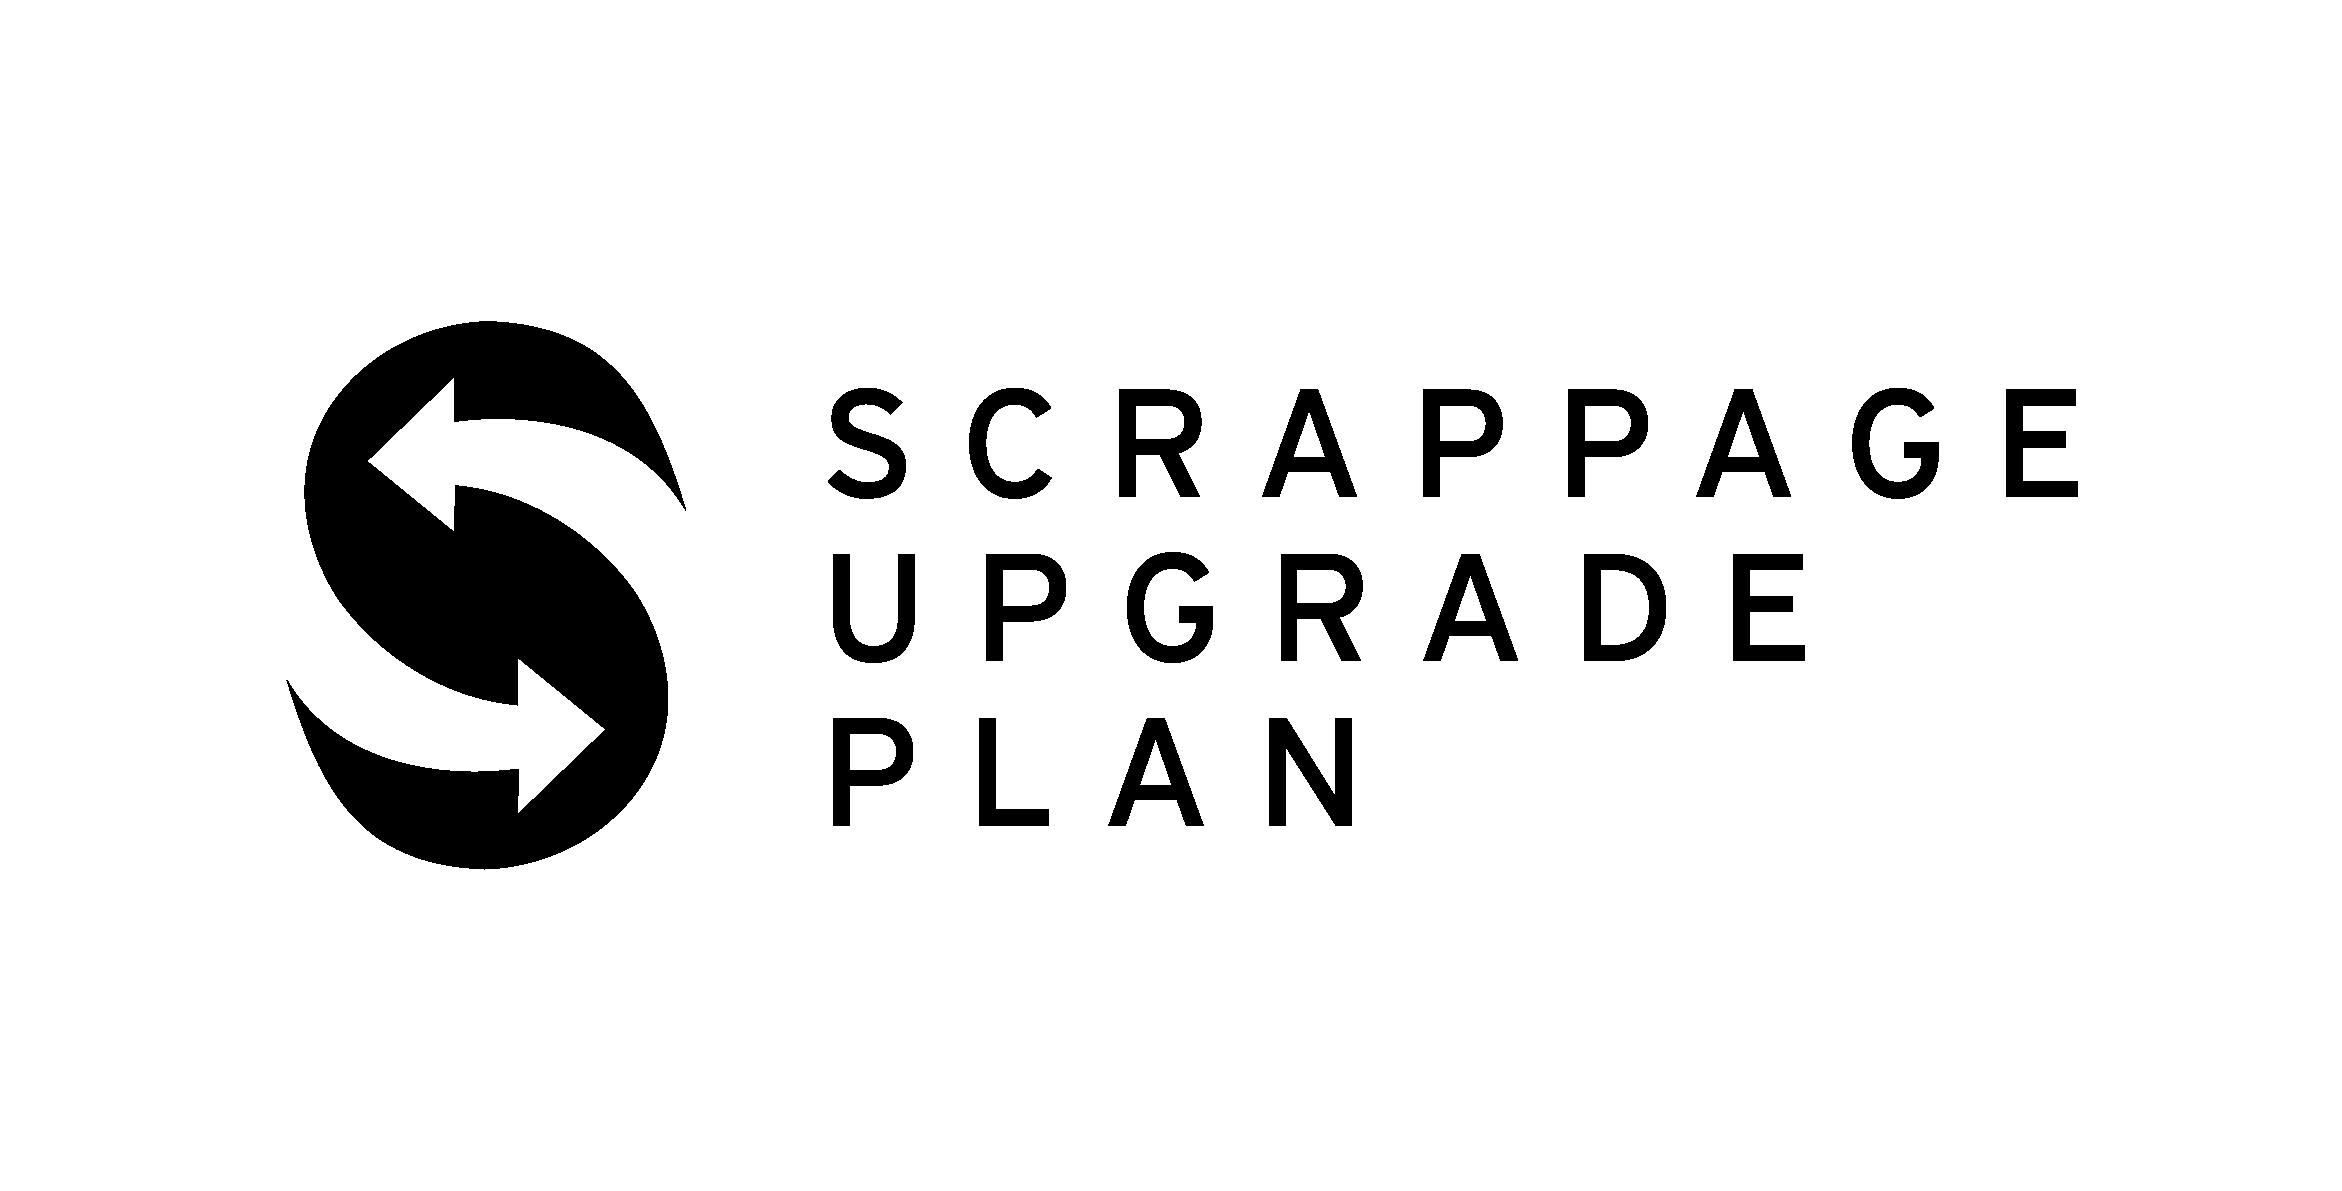 Scrappage Upgrade Plan